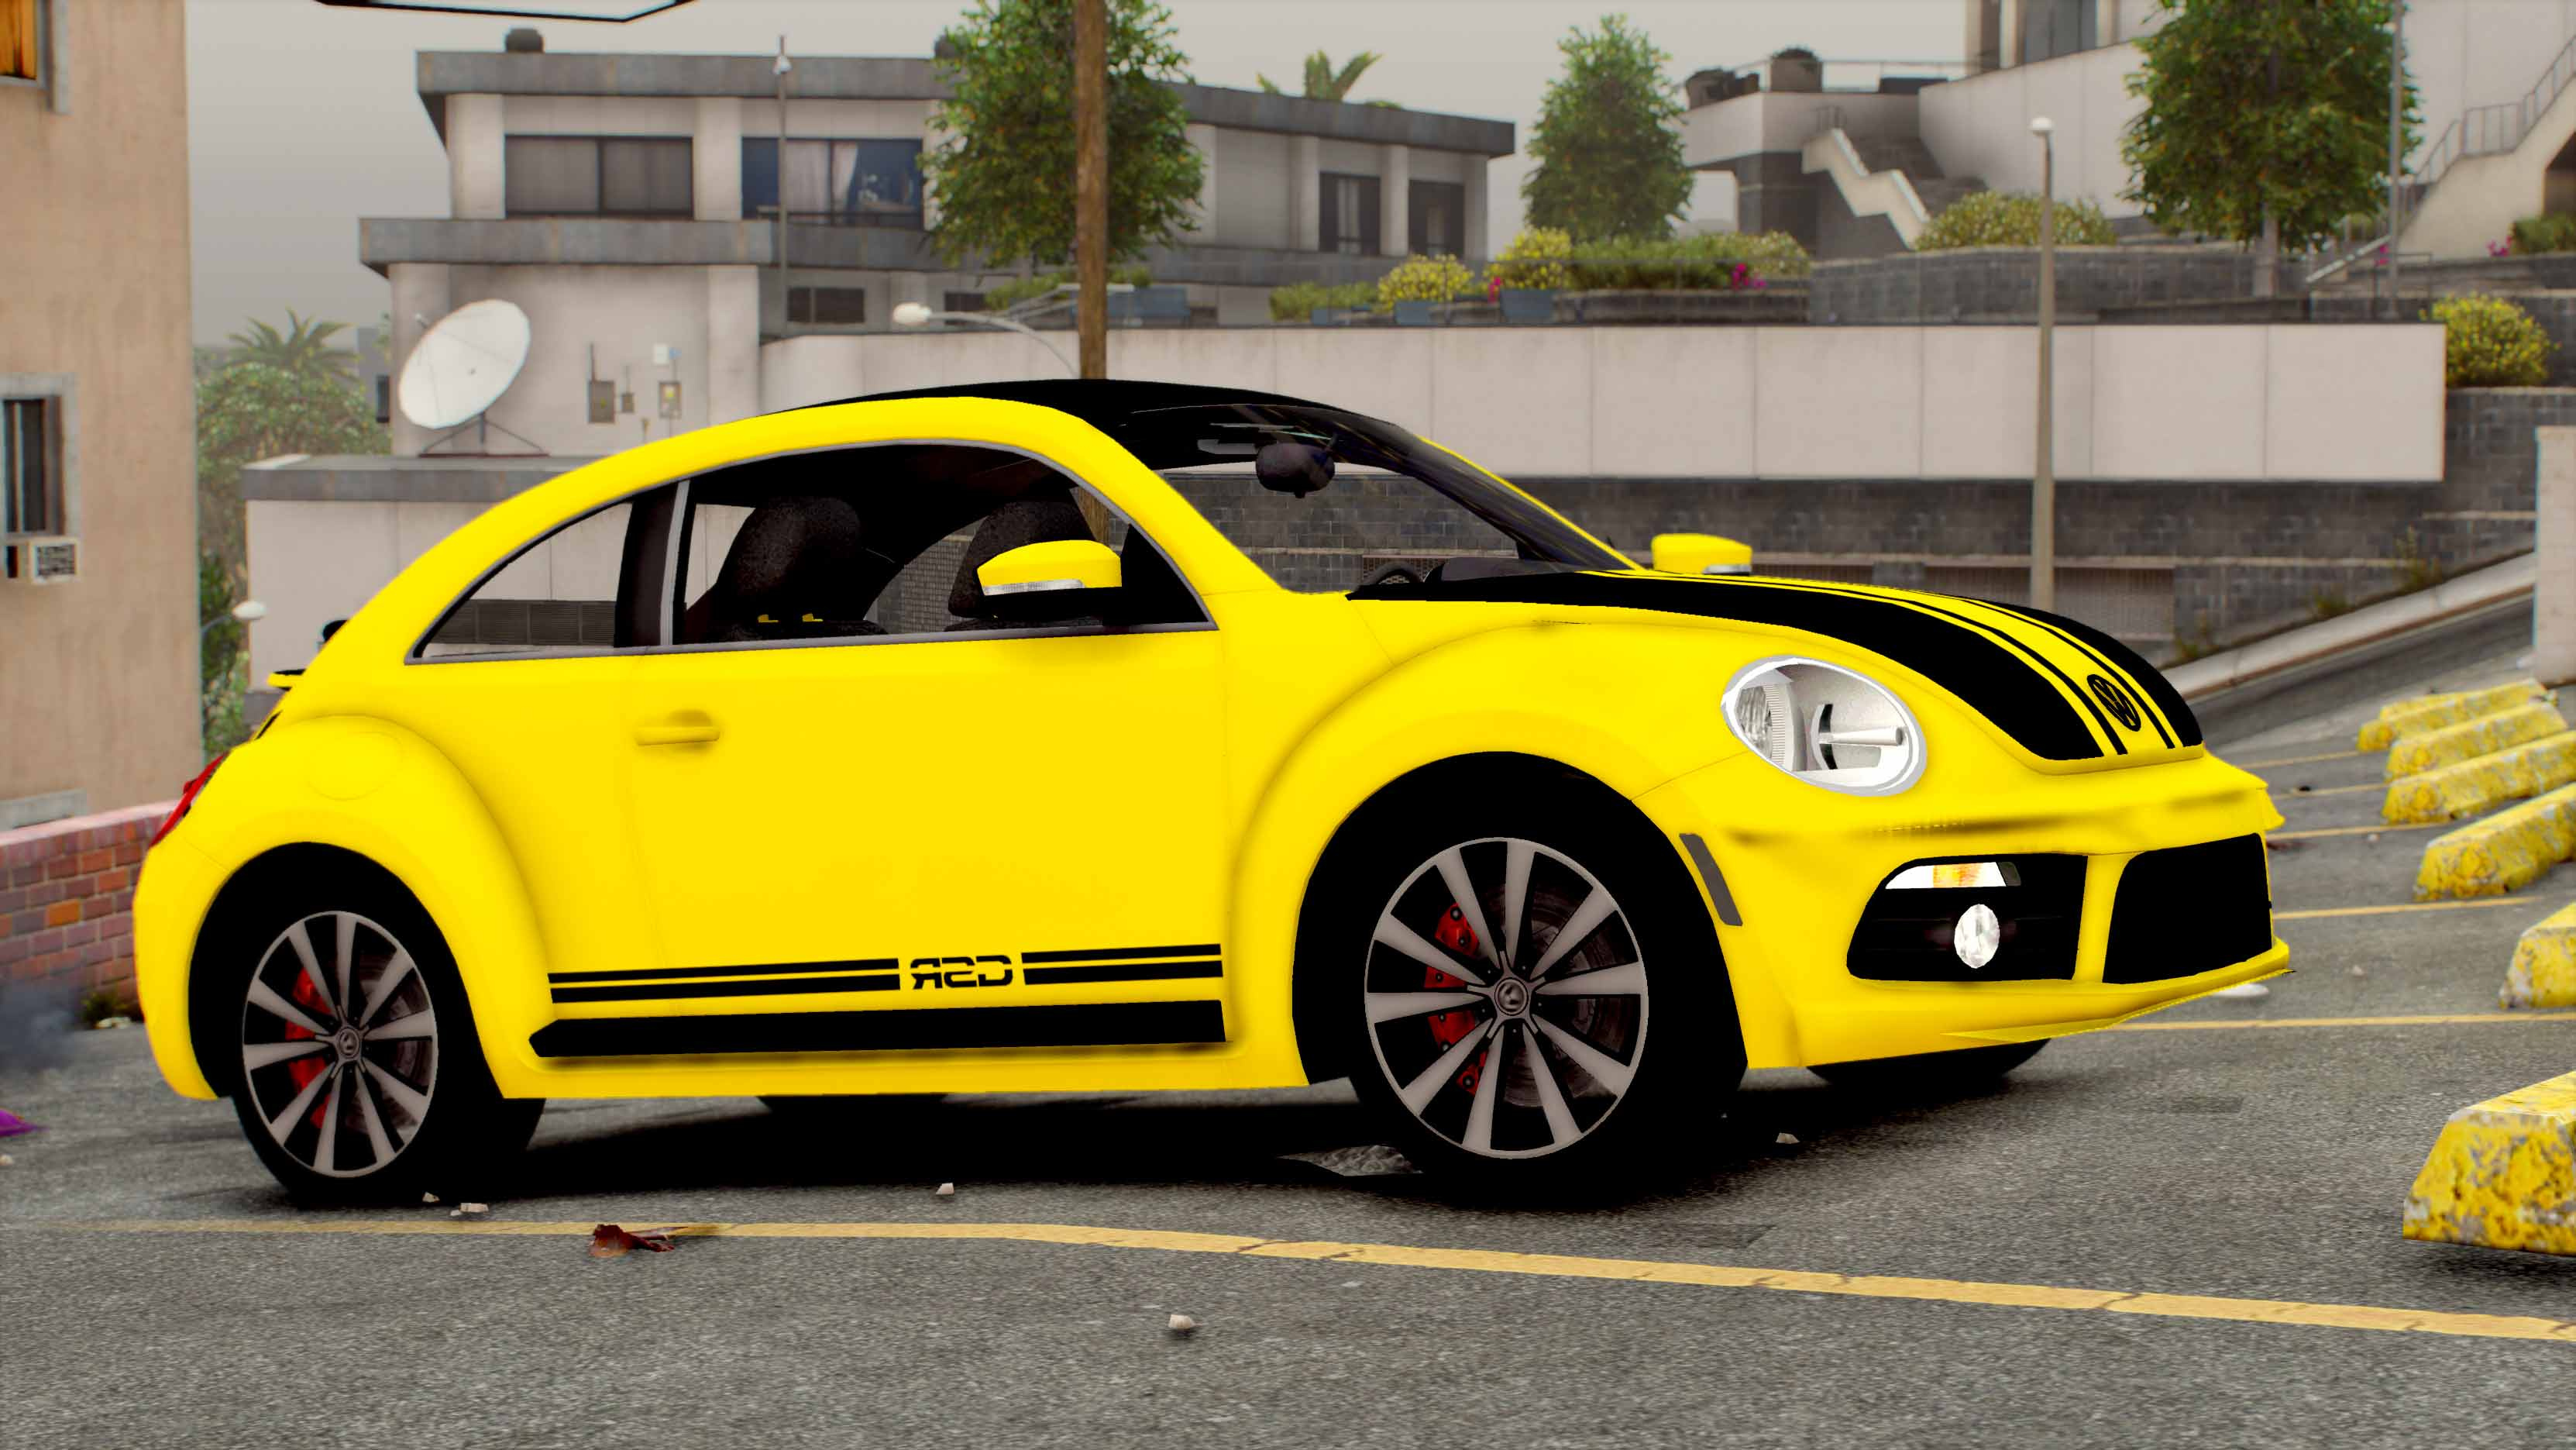 2012 Limited Edition VW Beetle GSR - GTA5-Mods.com